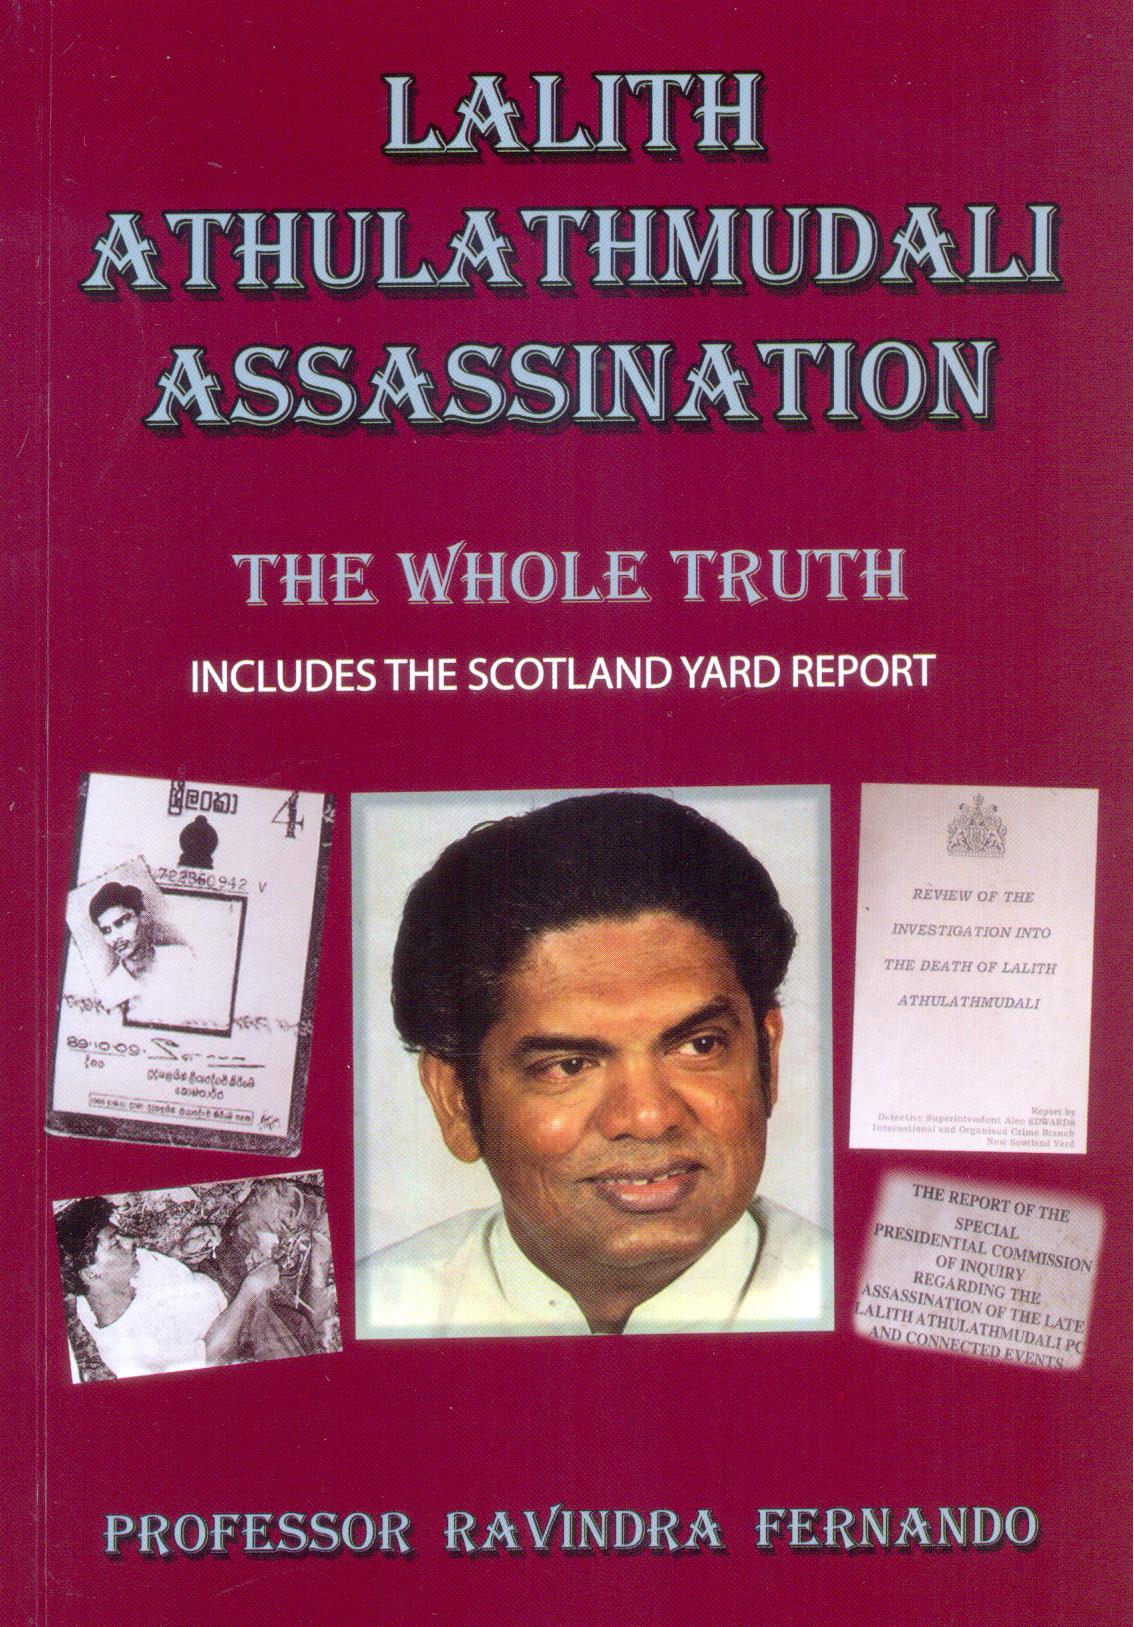 Lalith Athulathmudali Assassination : The Whole Truth